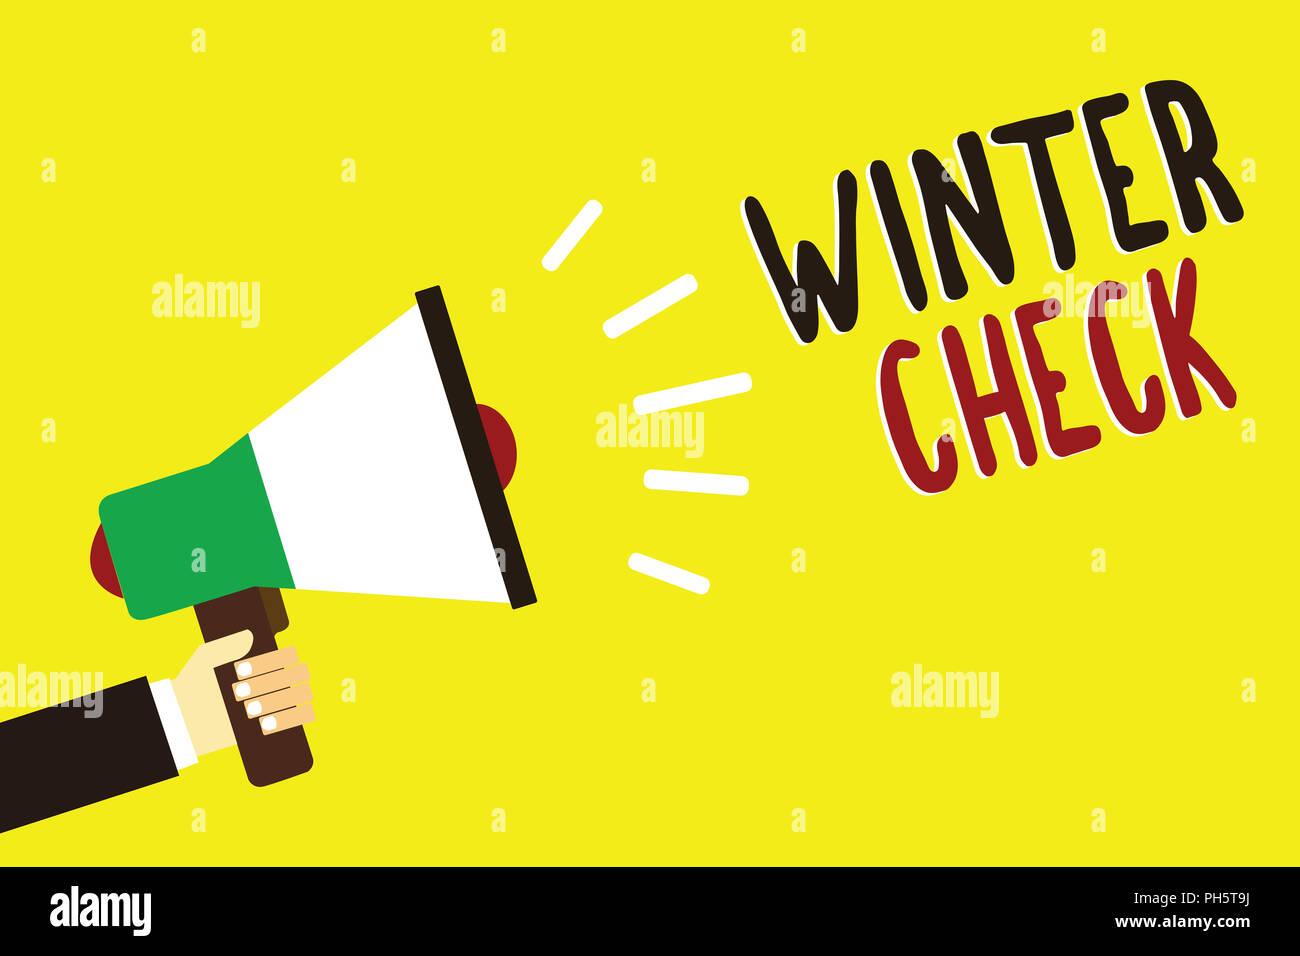 Text sign showing Winter Check. Conceptual photo Coldest Season Maintenance Preparedness Snow Shovel Hiemal Man holding megaphone loudspeaker yellow b - Stock Image